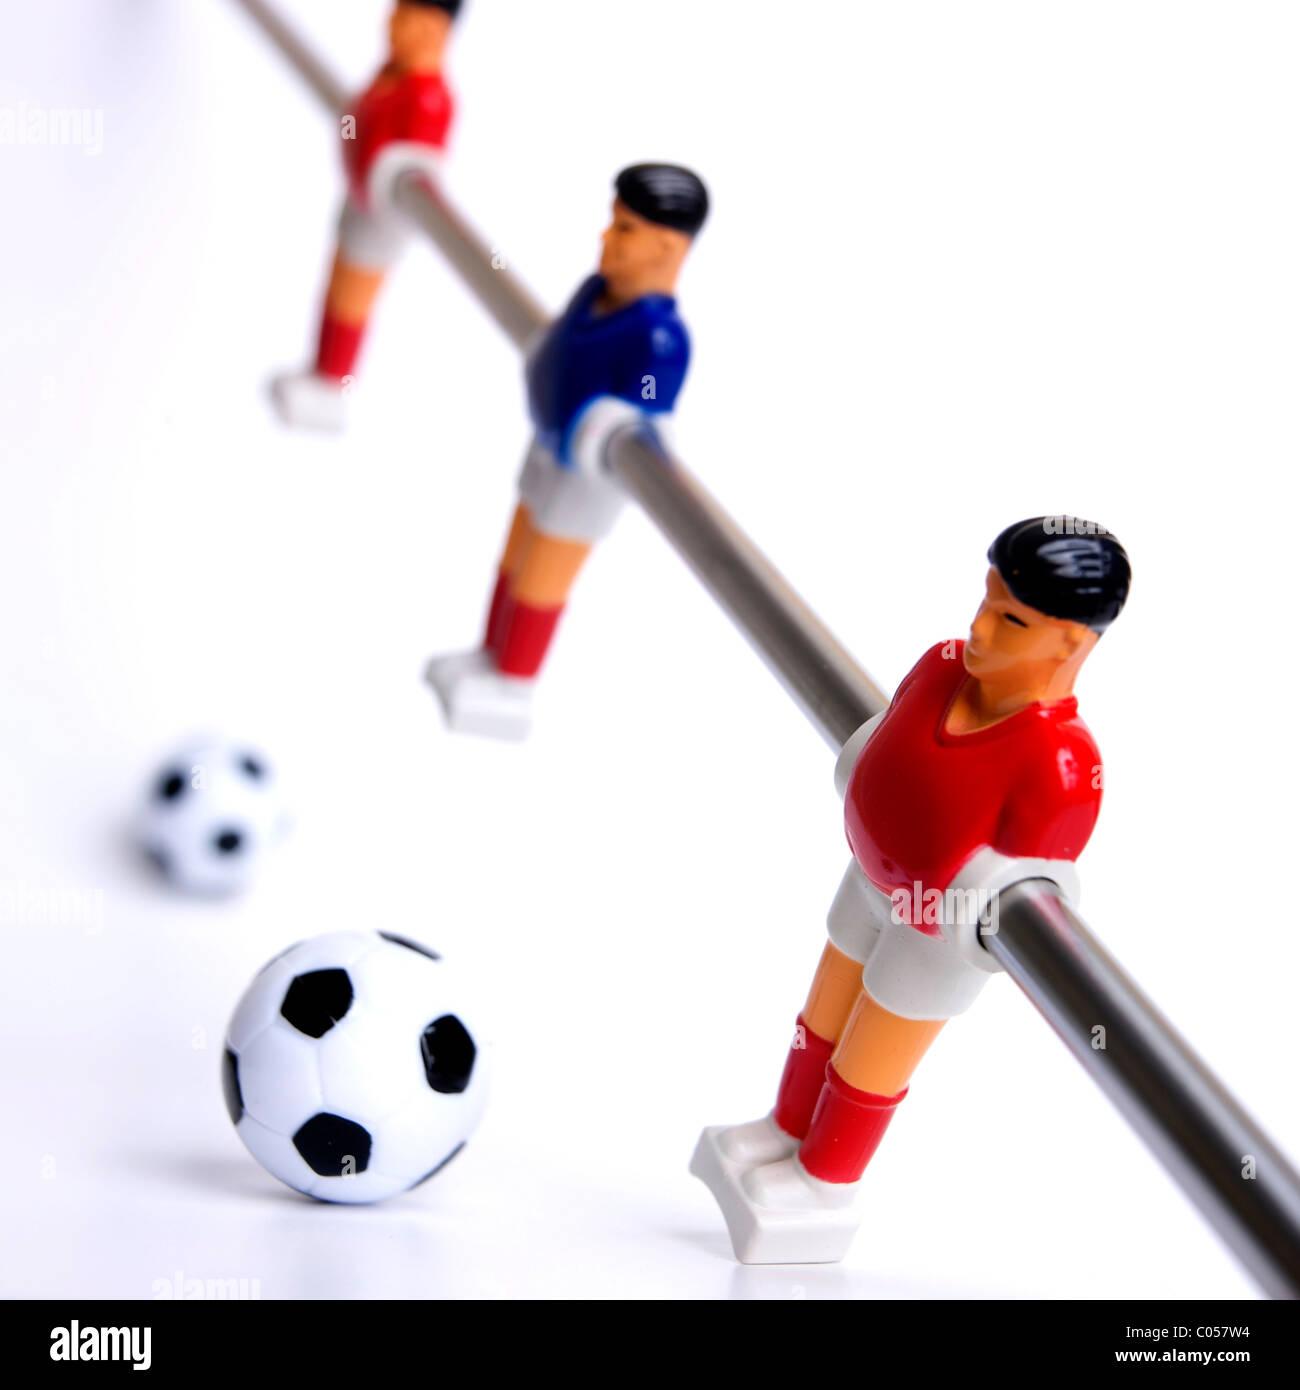 Table football / soccer - Stock Image